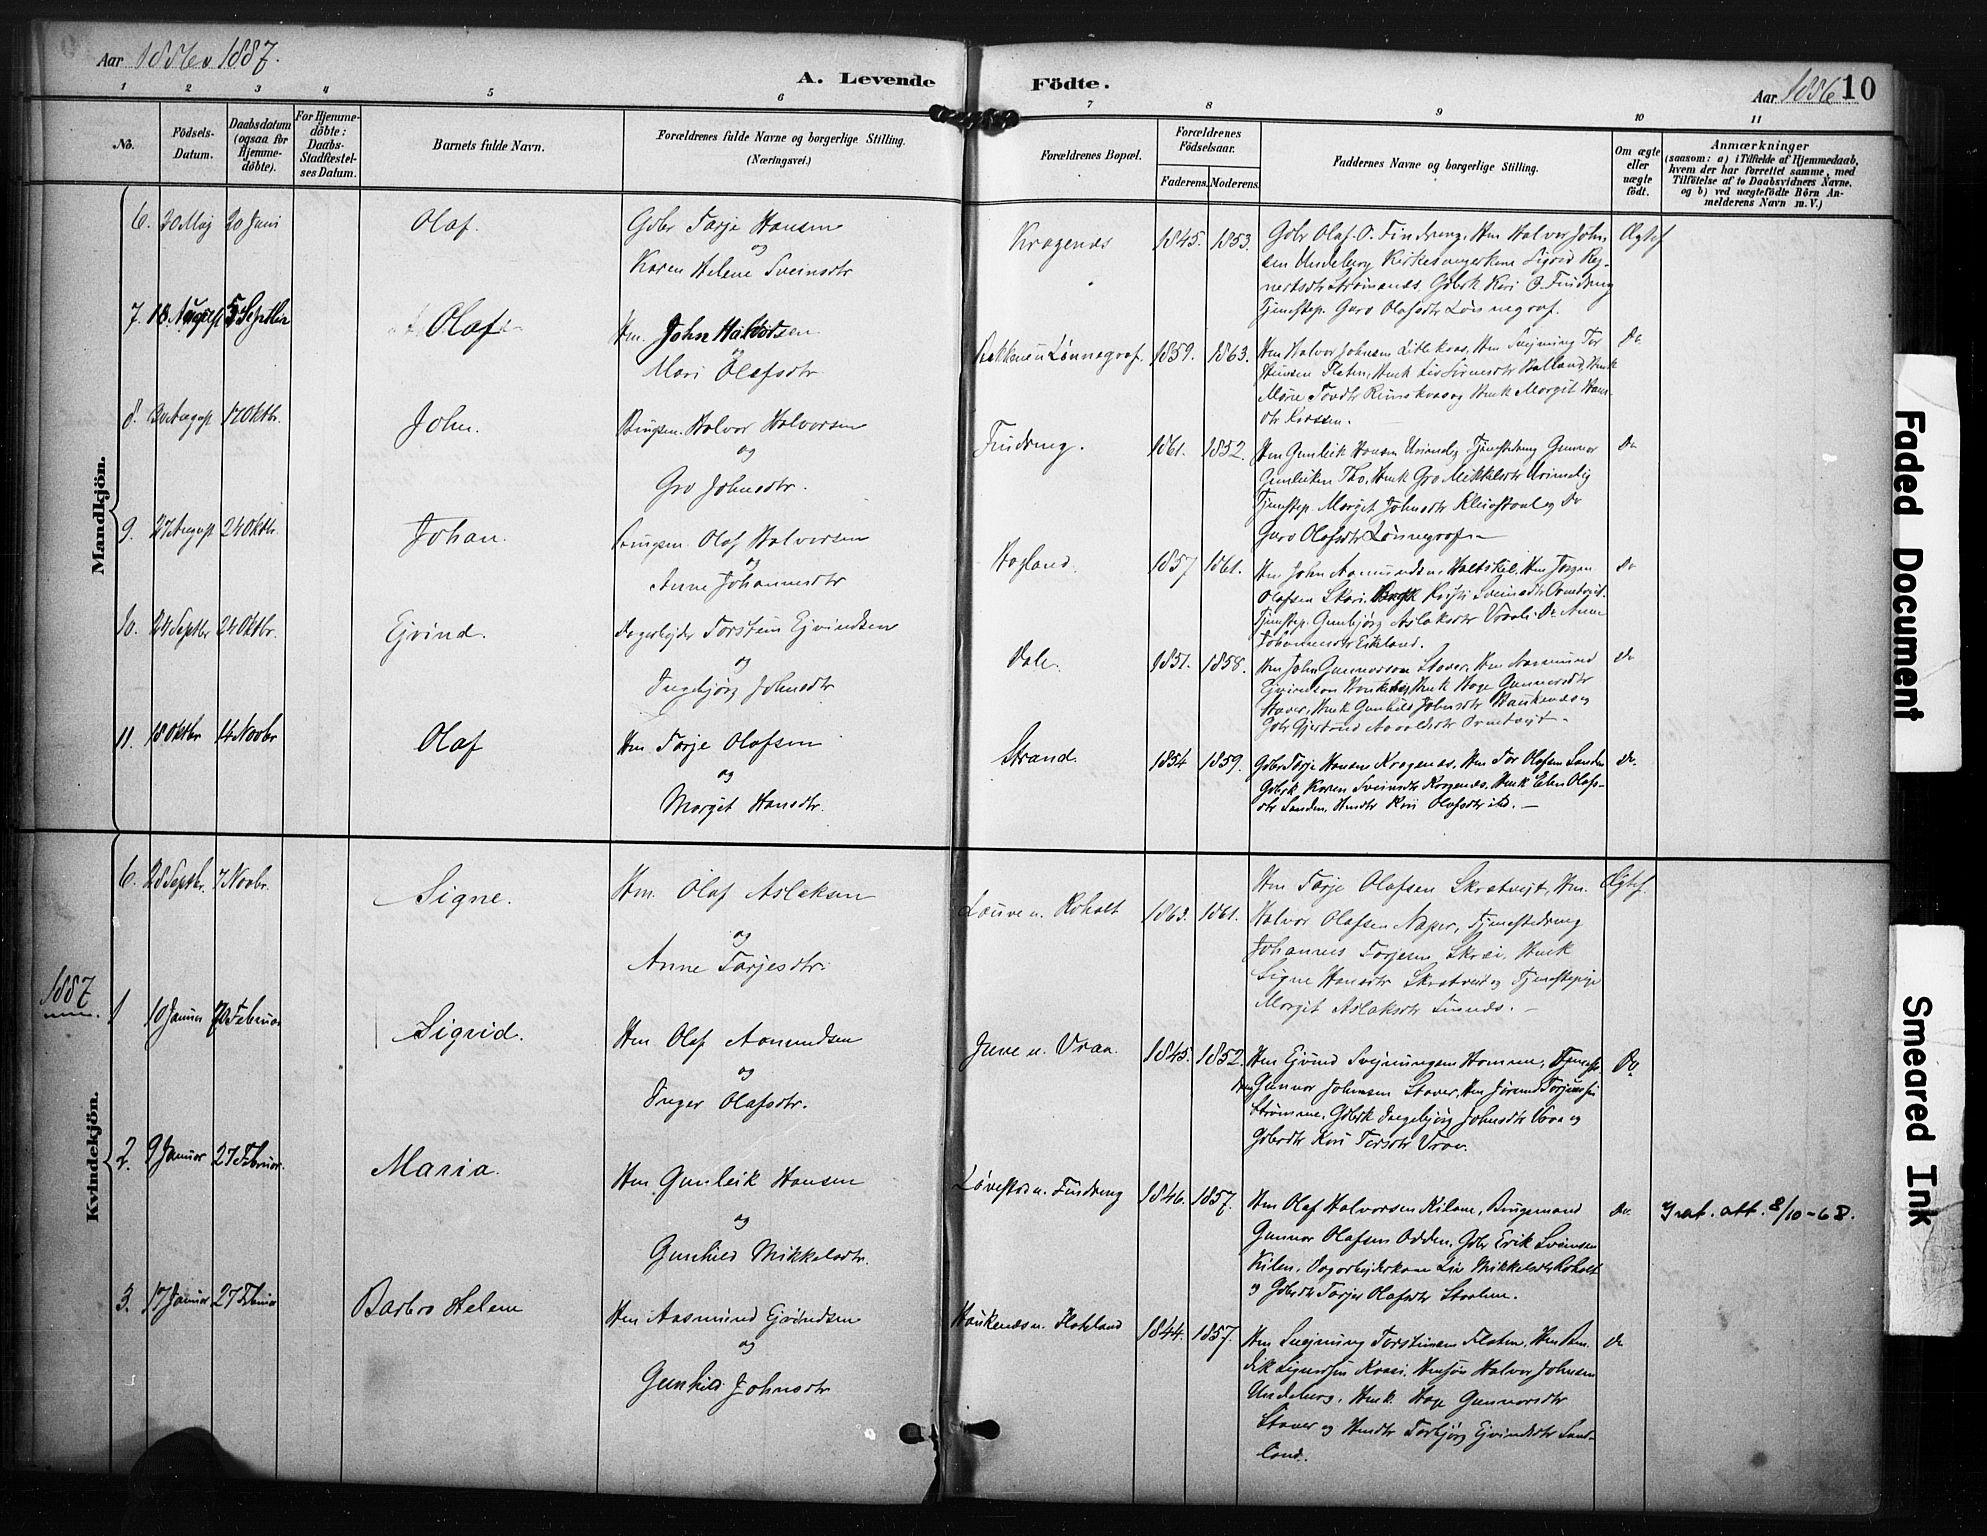 SAKO, Kviteseid kirkebøker, F/Fc/L0002: Ministerialbok nr. III 2, 1882-1908, s. 10